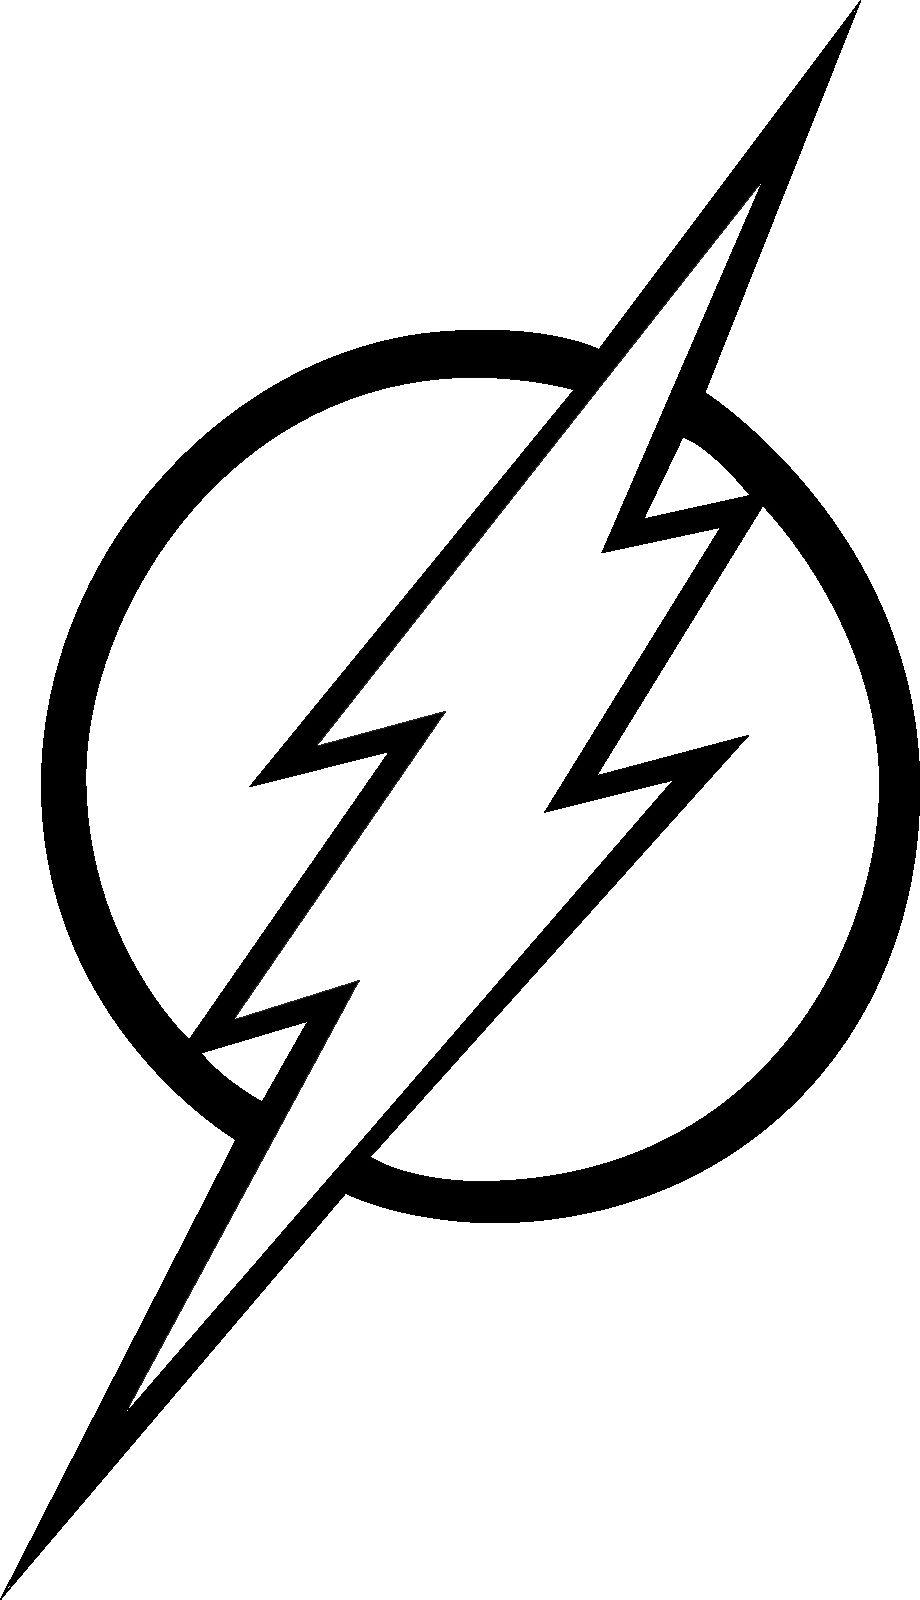 Superhero Logo Clipart Black And White.